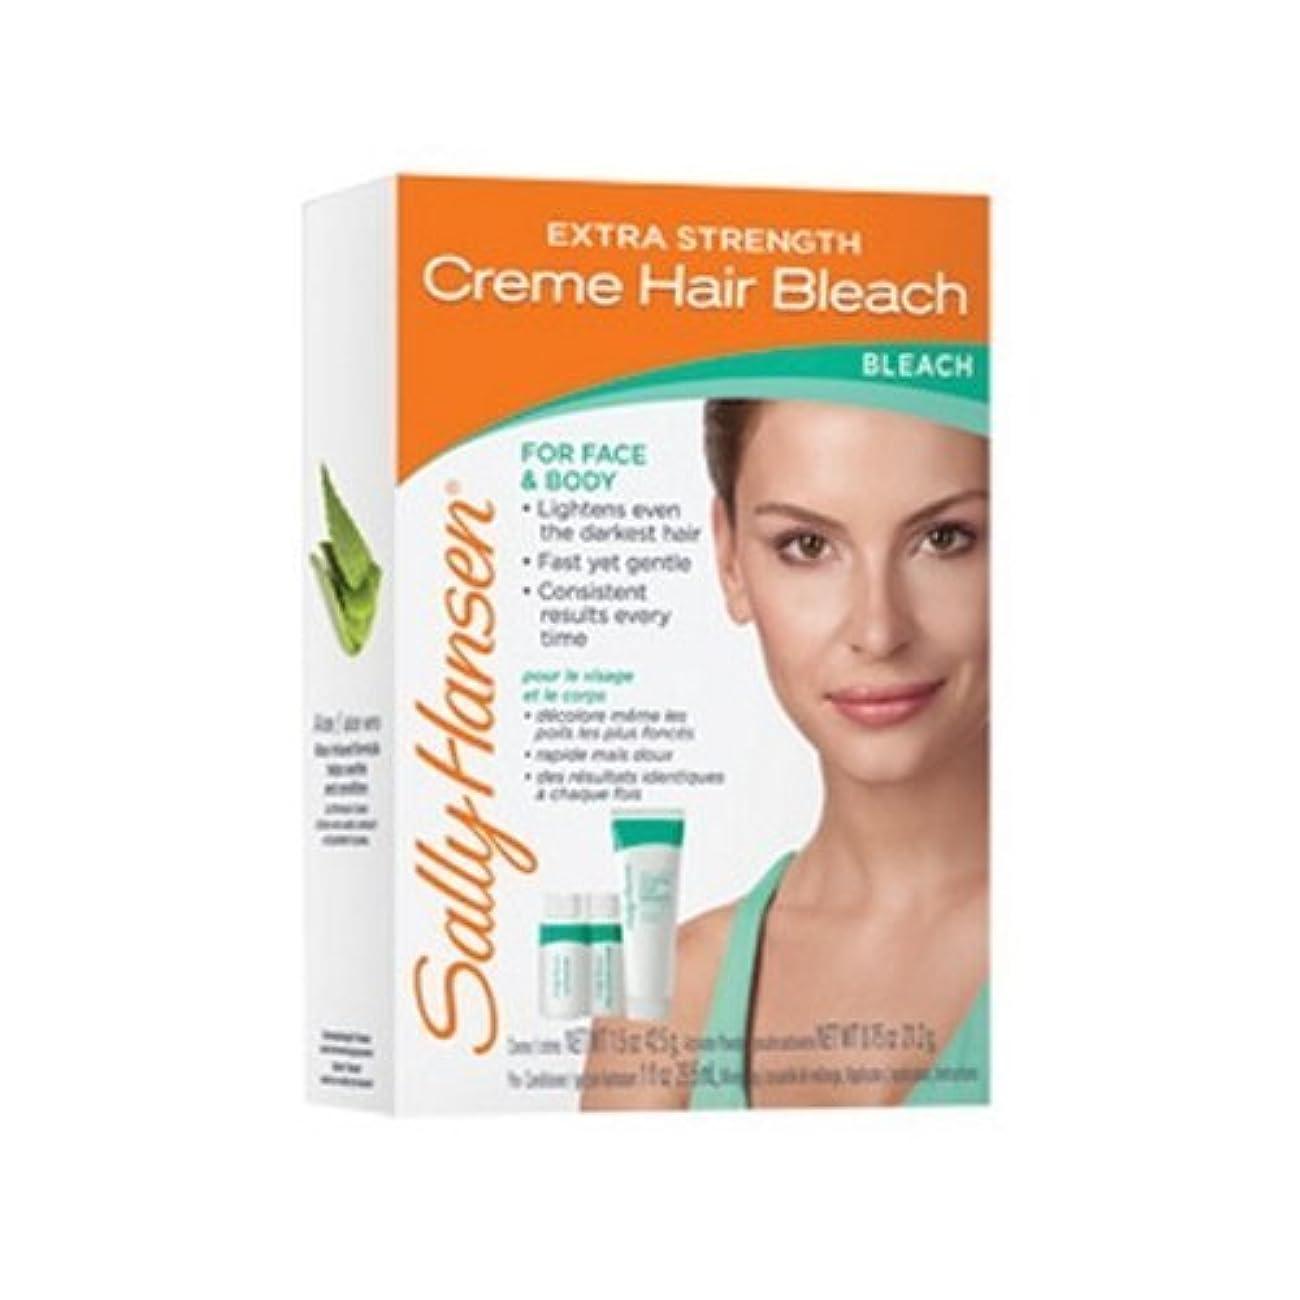 抑制薬用従順な(3 Pack) SALLY HANSEN Extra Strength Creme Hair Bleach for Face & Body - SH2010 (並行輸入品)